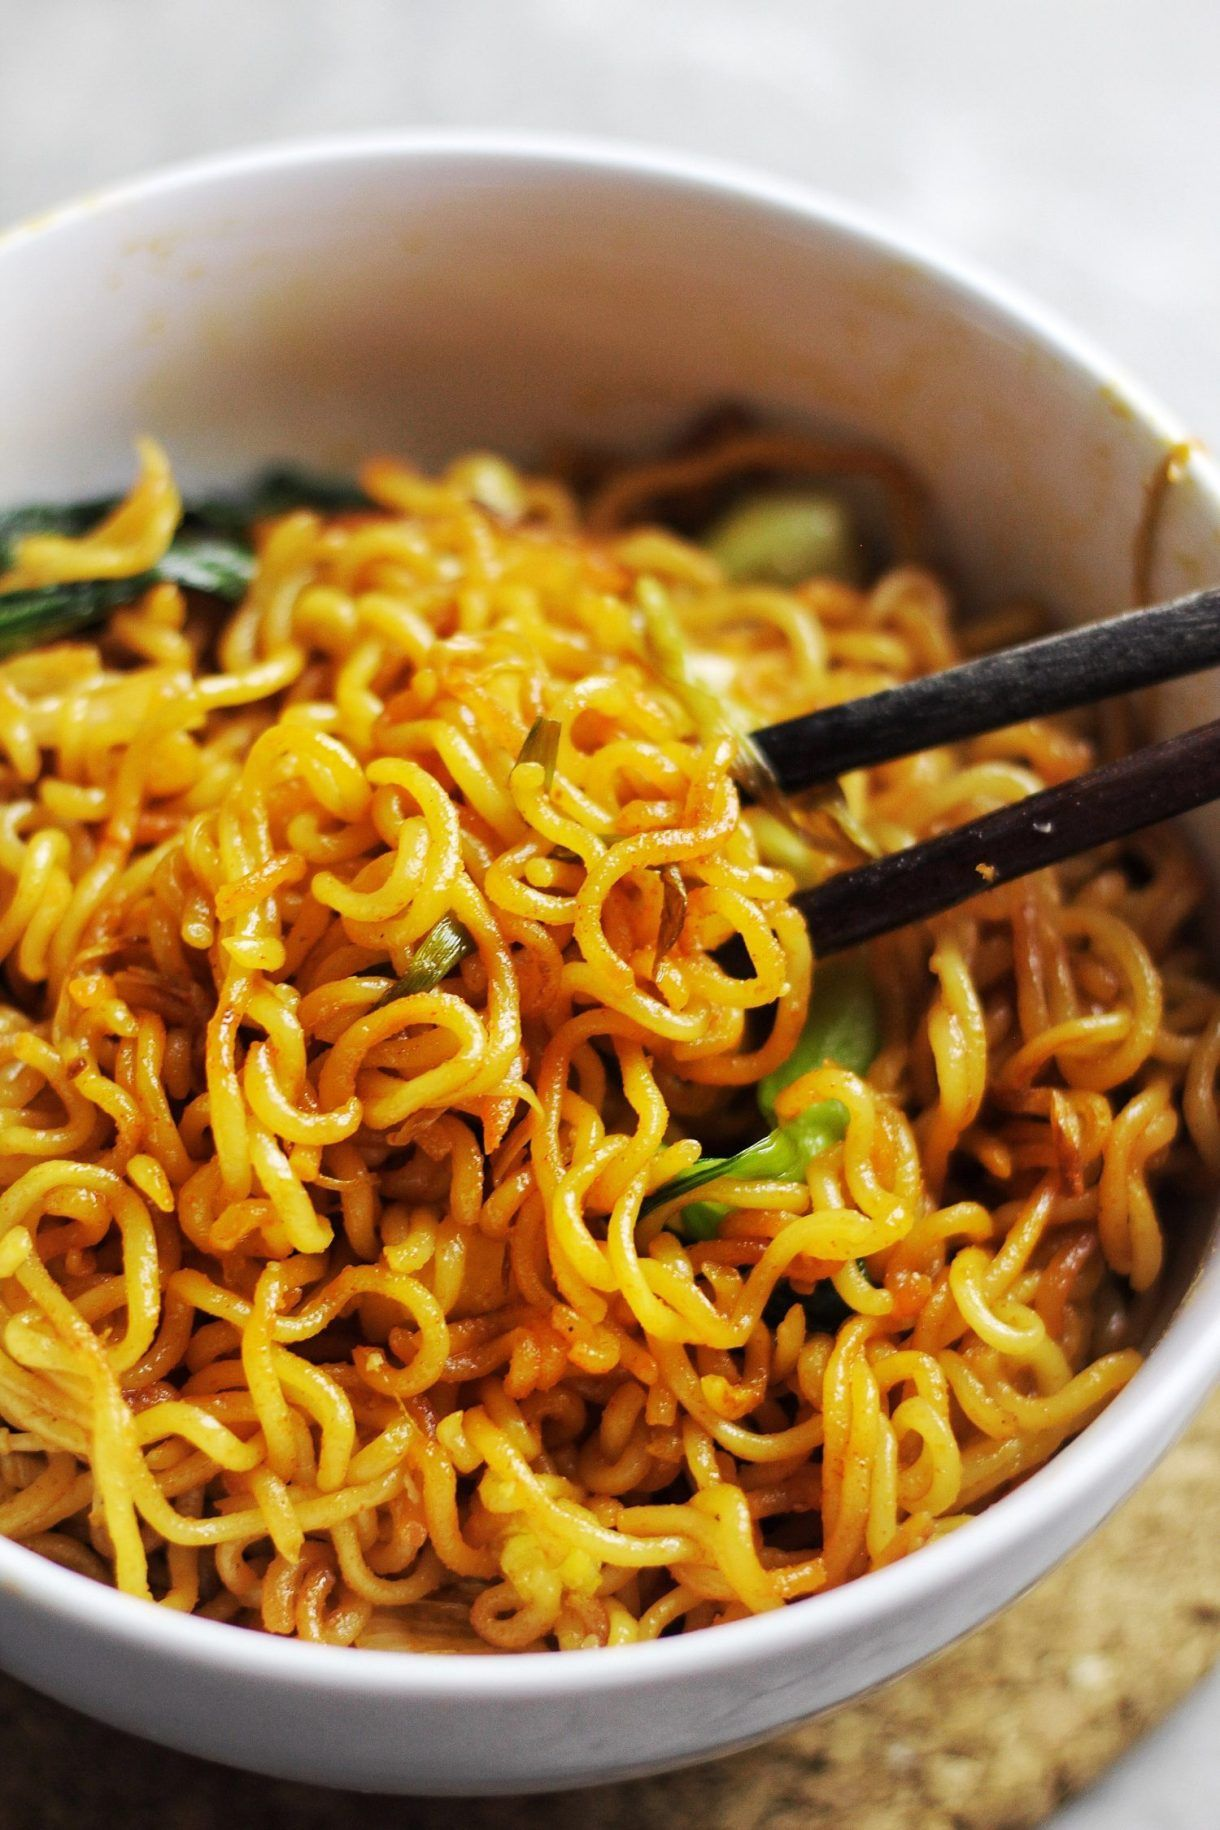 Instant Ramen Upgrade Easy 30 Minute Spicy Fried Noodles Couple Eats Food Recipe Spicy Ramen Instant Ramen Top Ramen Recipes